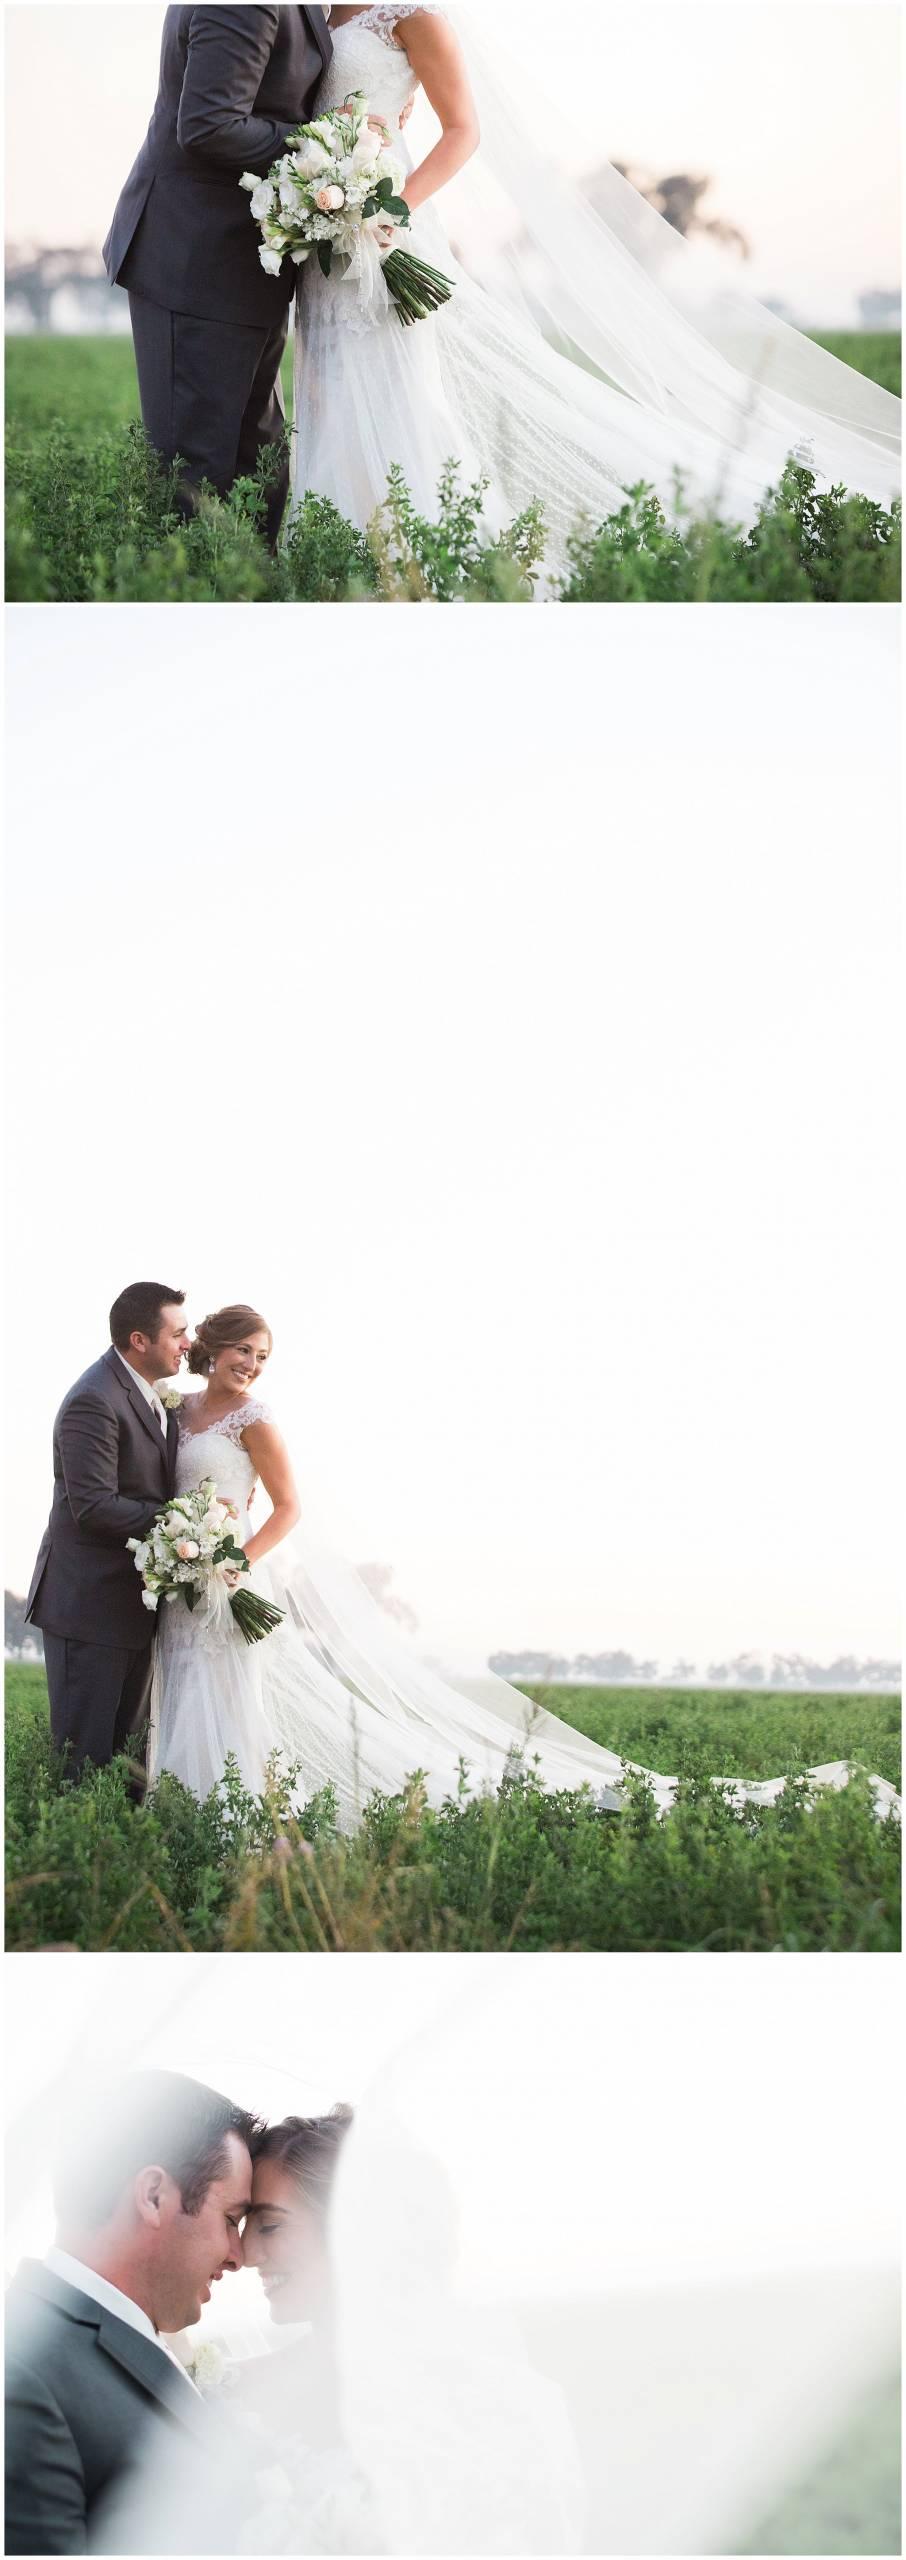 Kelcie & Devin Wedding Third Element Photography & Cinema Koetsier Ranch Visalia Tulare Fresno Hybrid Film Wedding Photographer_0024